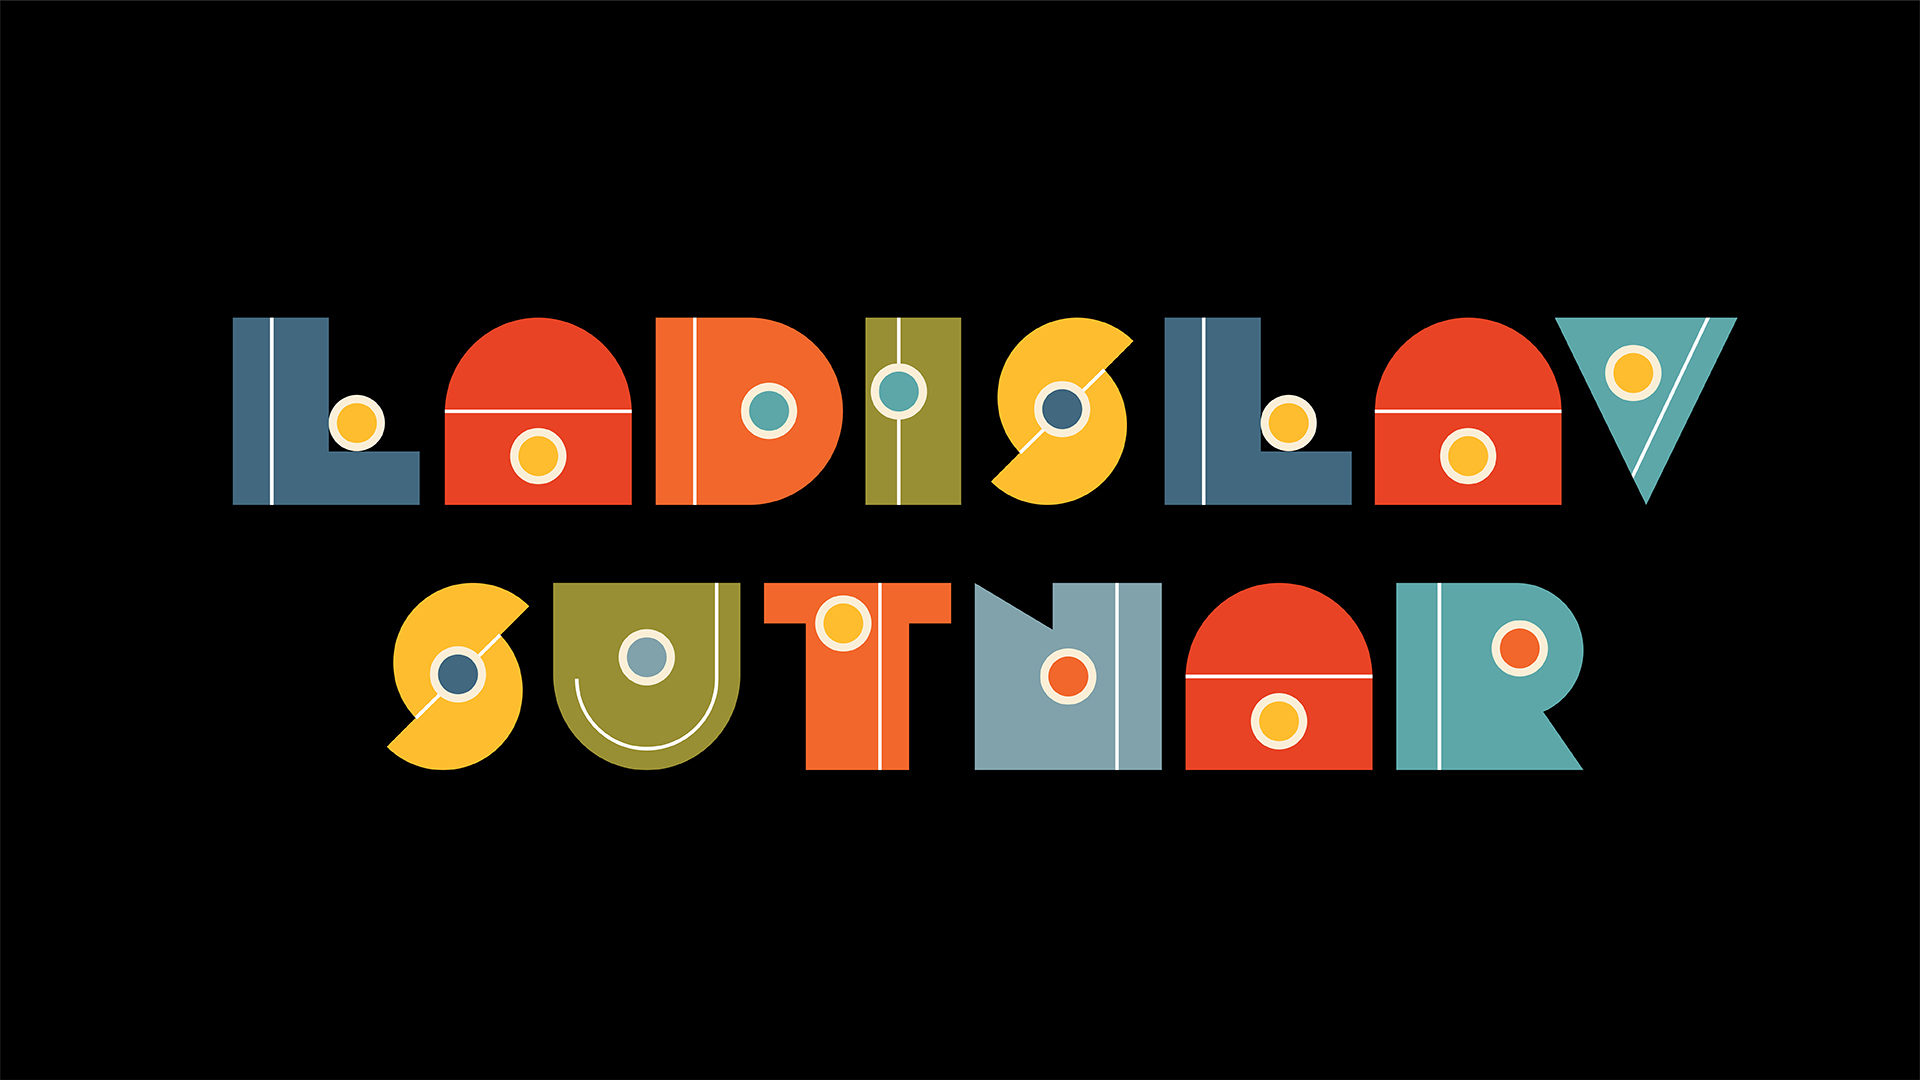 """LADISLAV SUTNAR"" custom type design by Eunji Kim"